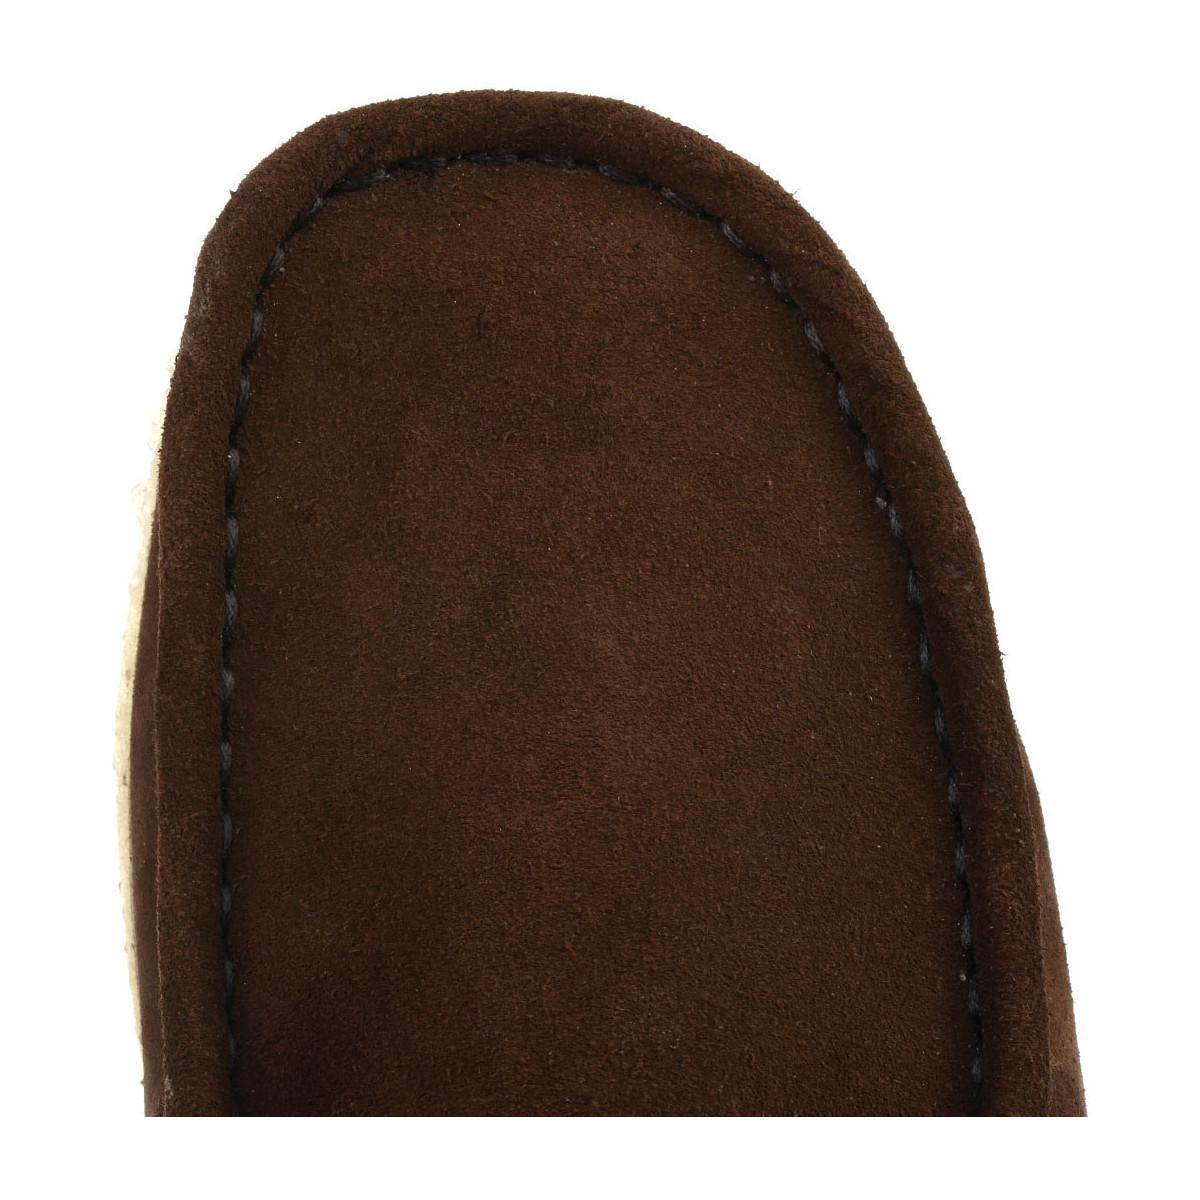 Clarks Originals Mens Dark Brown Wallabee Suede Shoes Men's Casual Shoes In Brown for Men